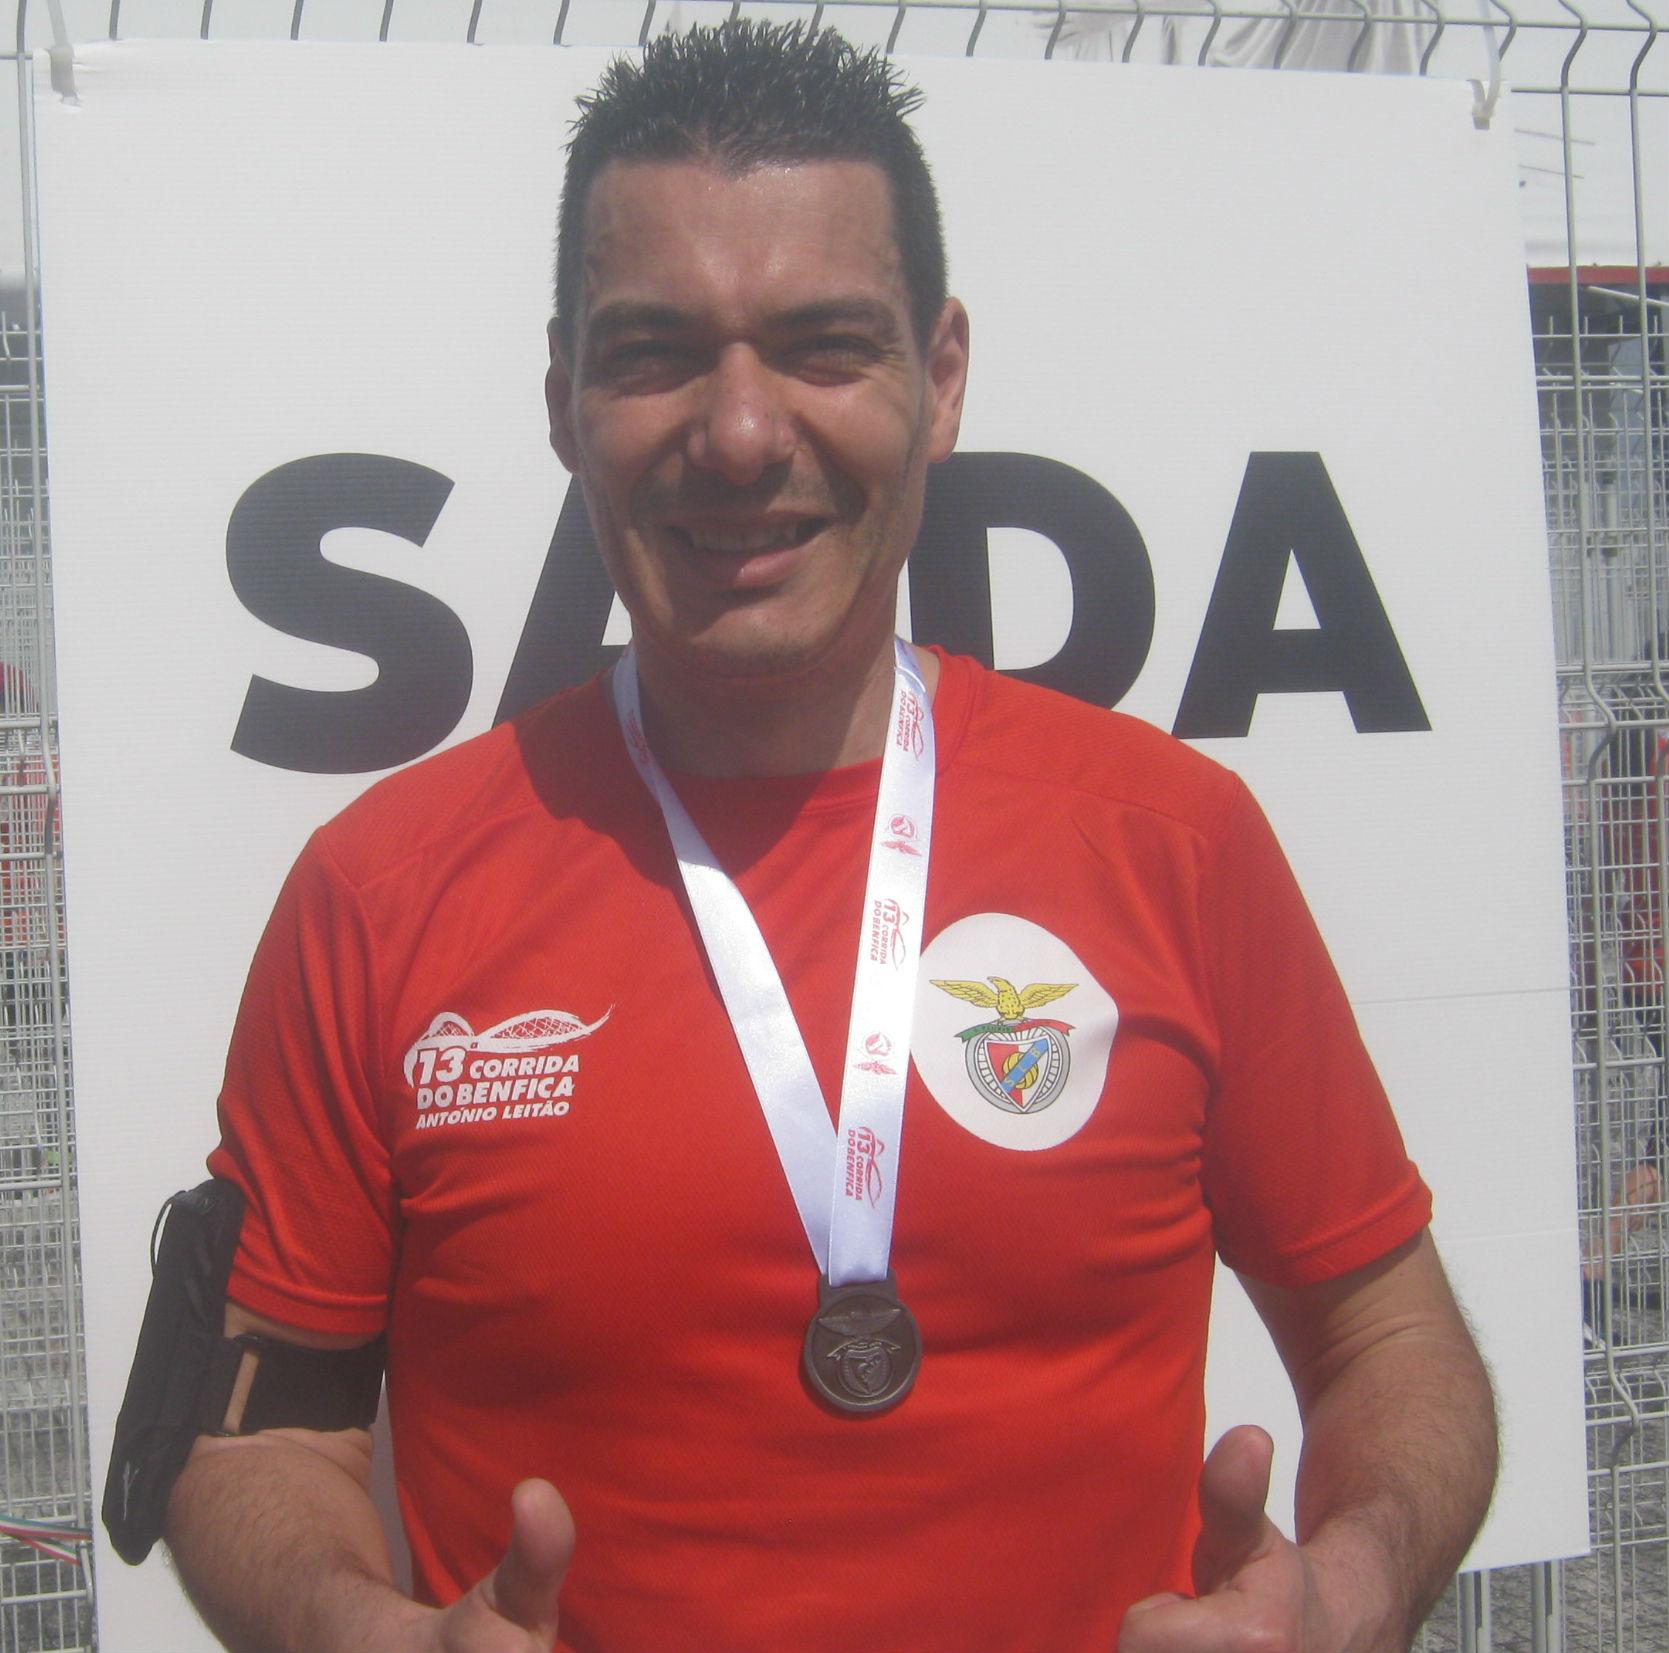 Corrida do Benfica2018-Firmino Duarte